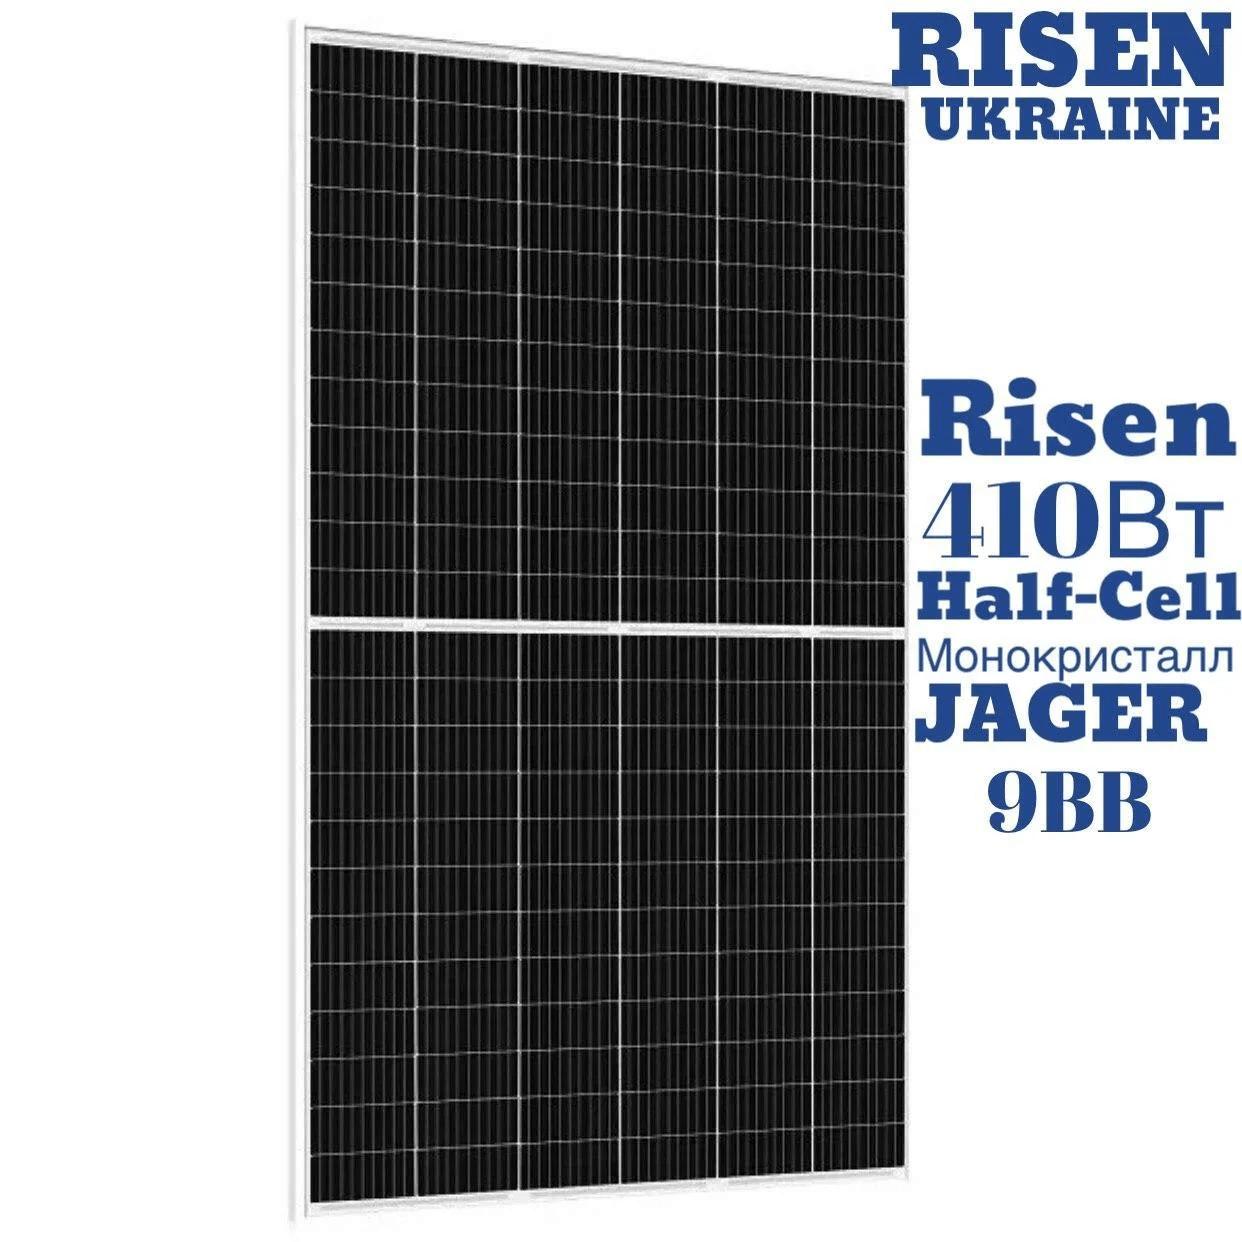 Сонячна панель 410 Вт моно, RSM144-6-410M Risen 9BB JAGER